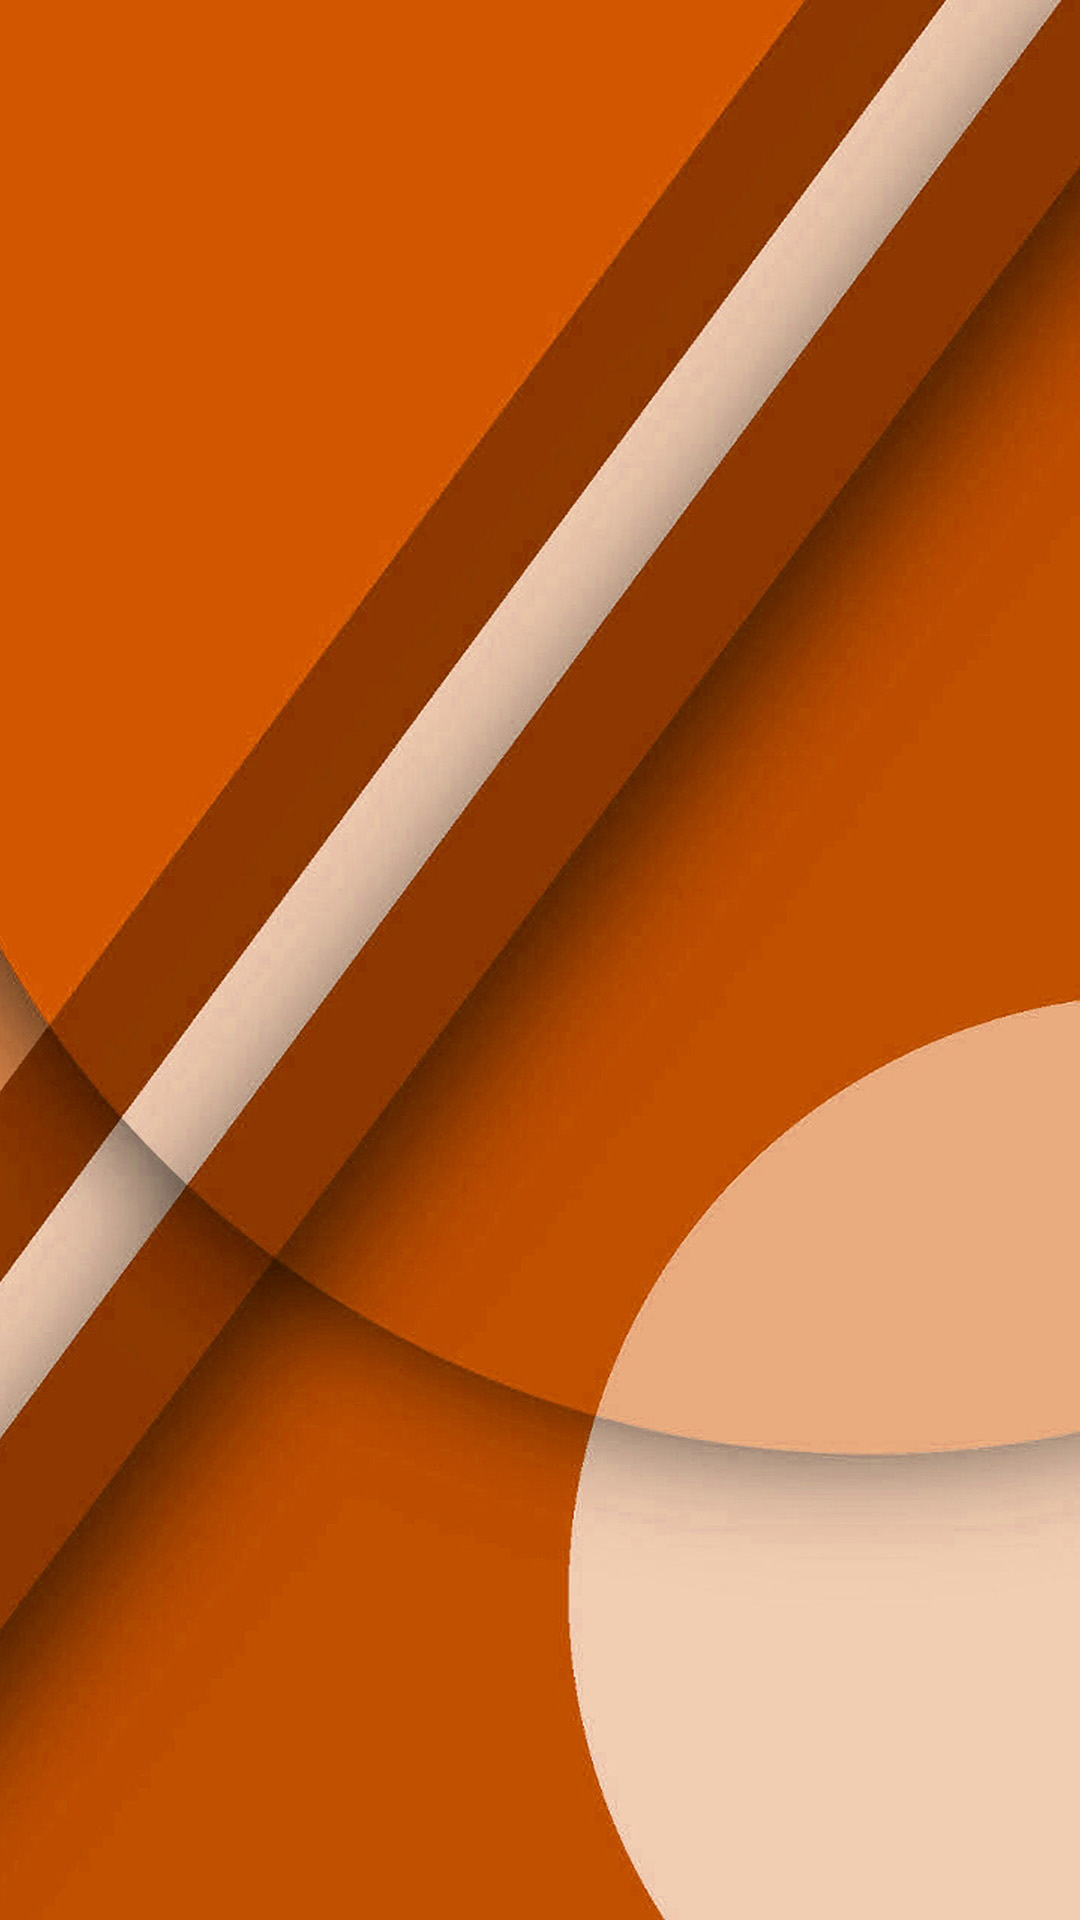 Beautiful orange geometric iphone 6 plus wallpaper iPhone 6 Plus 1080x1920